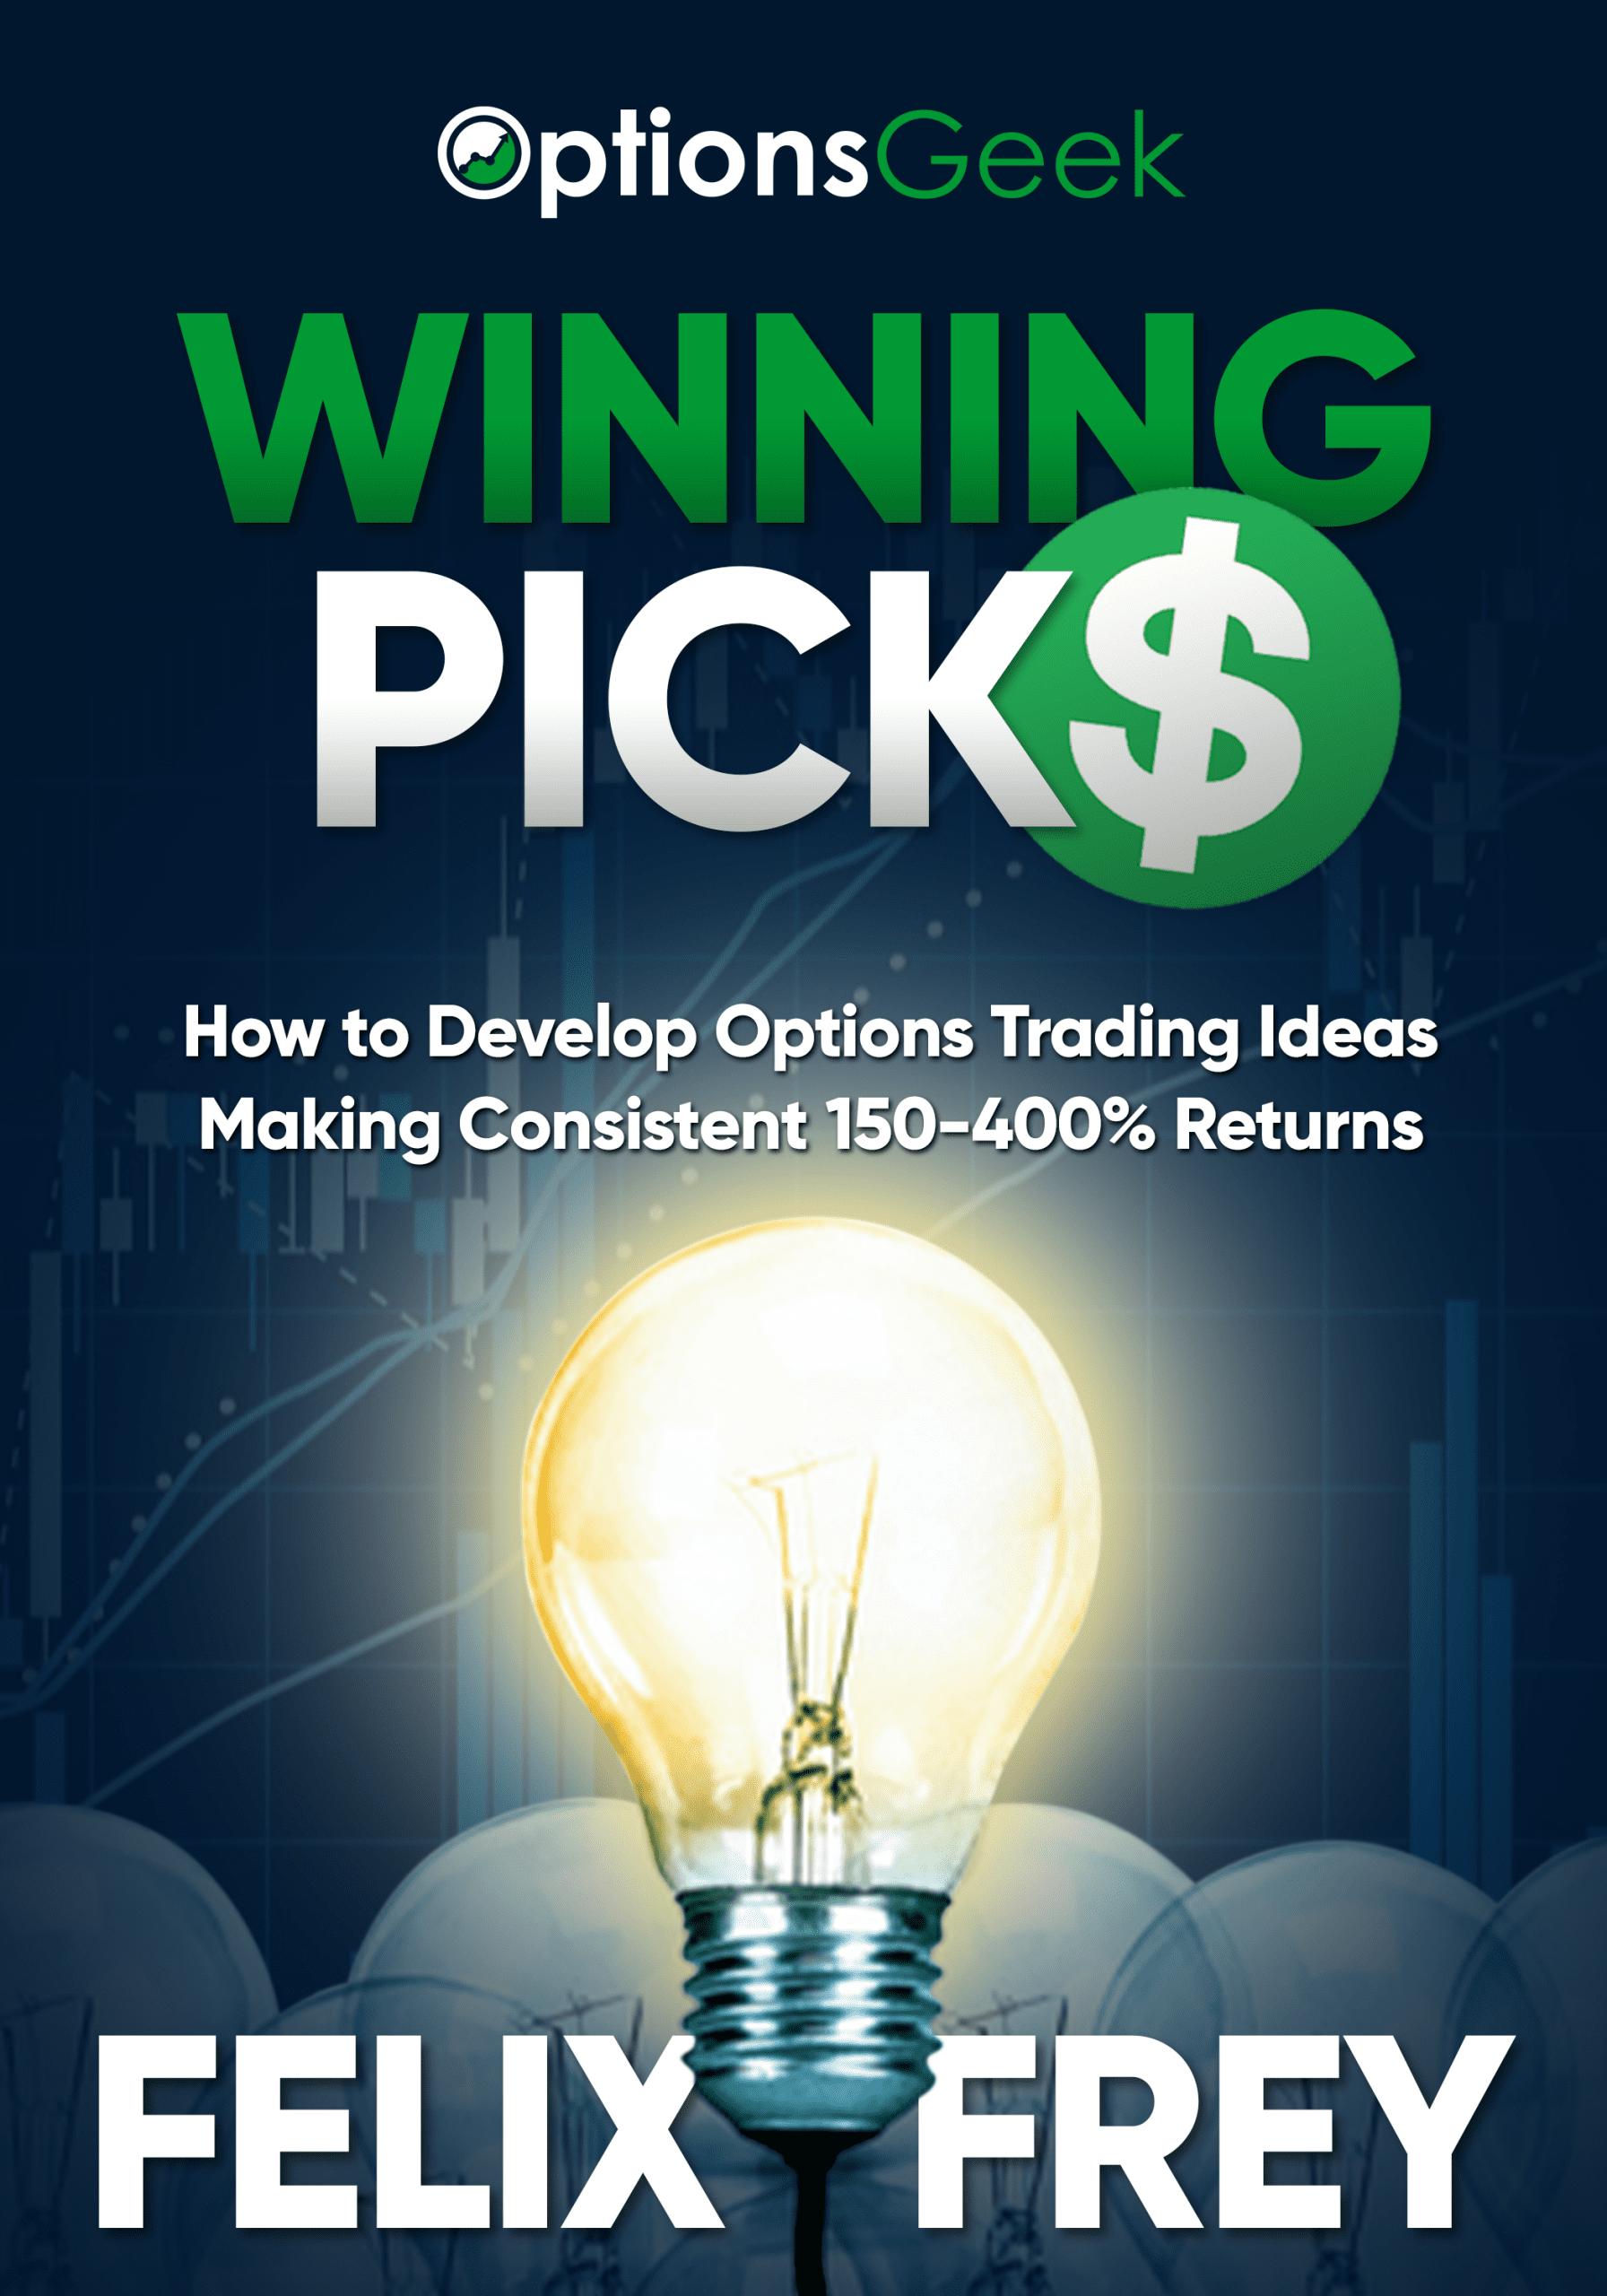 winning picks book cover